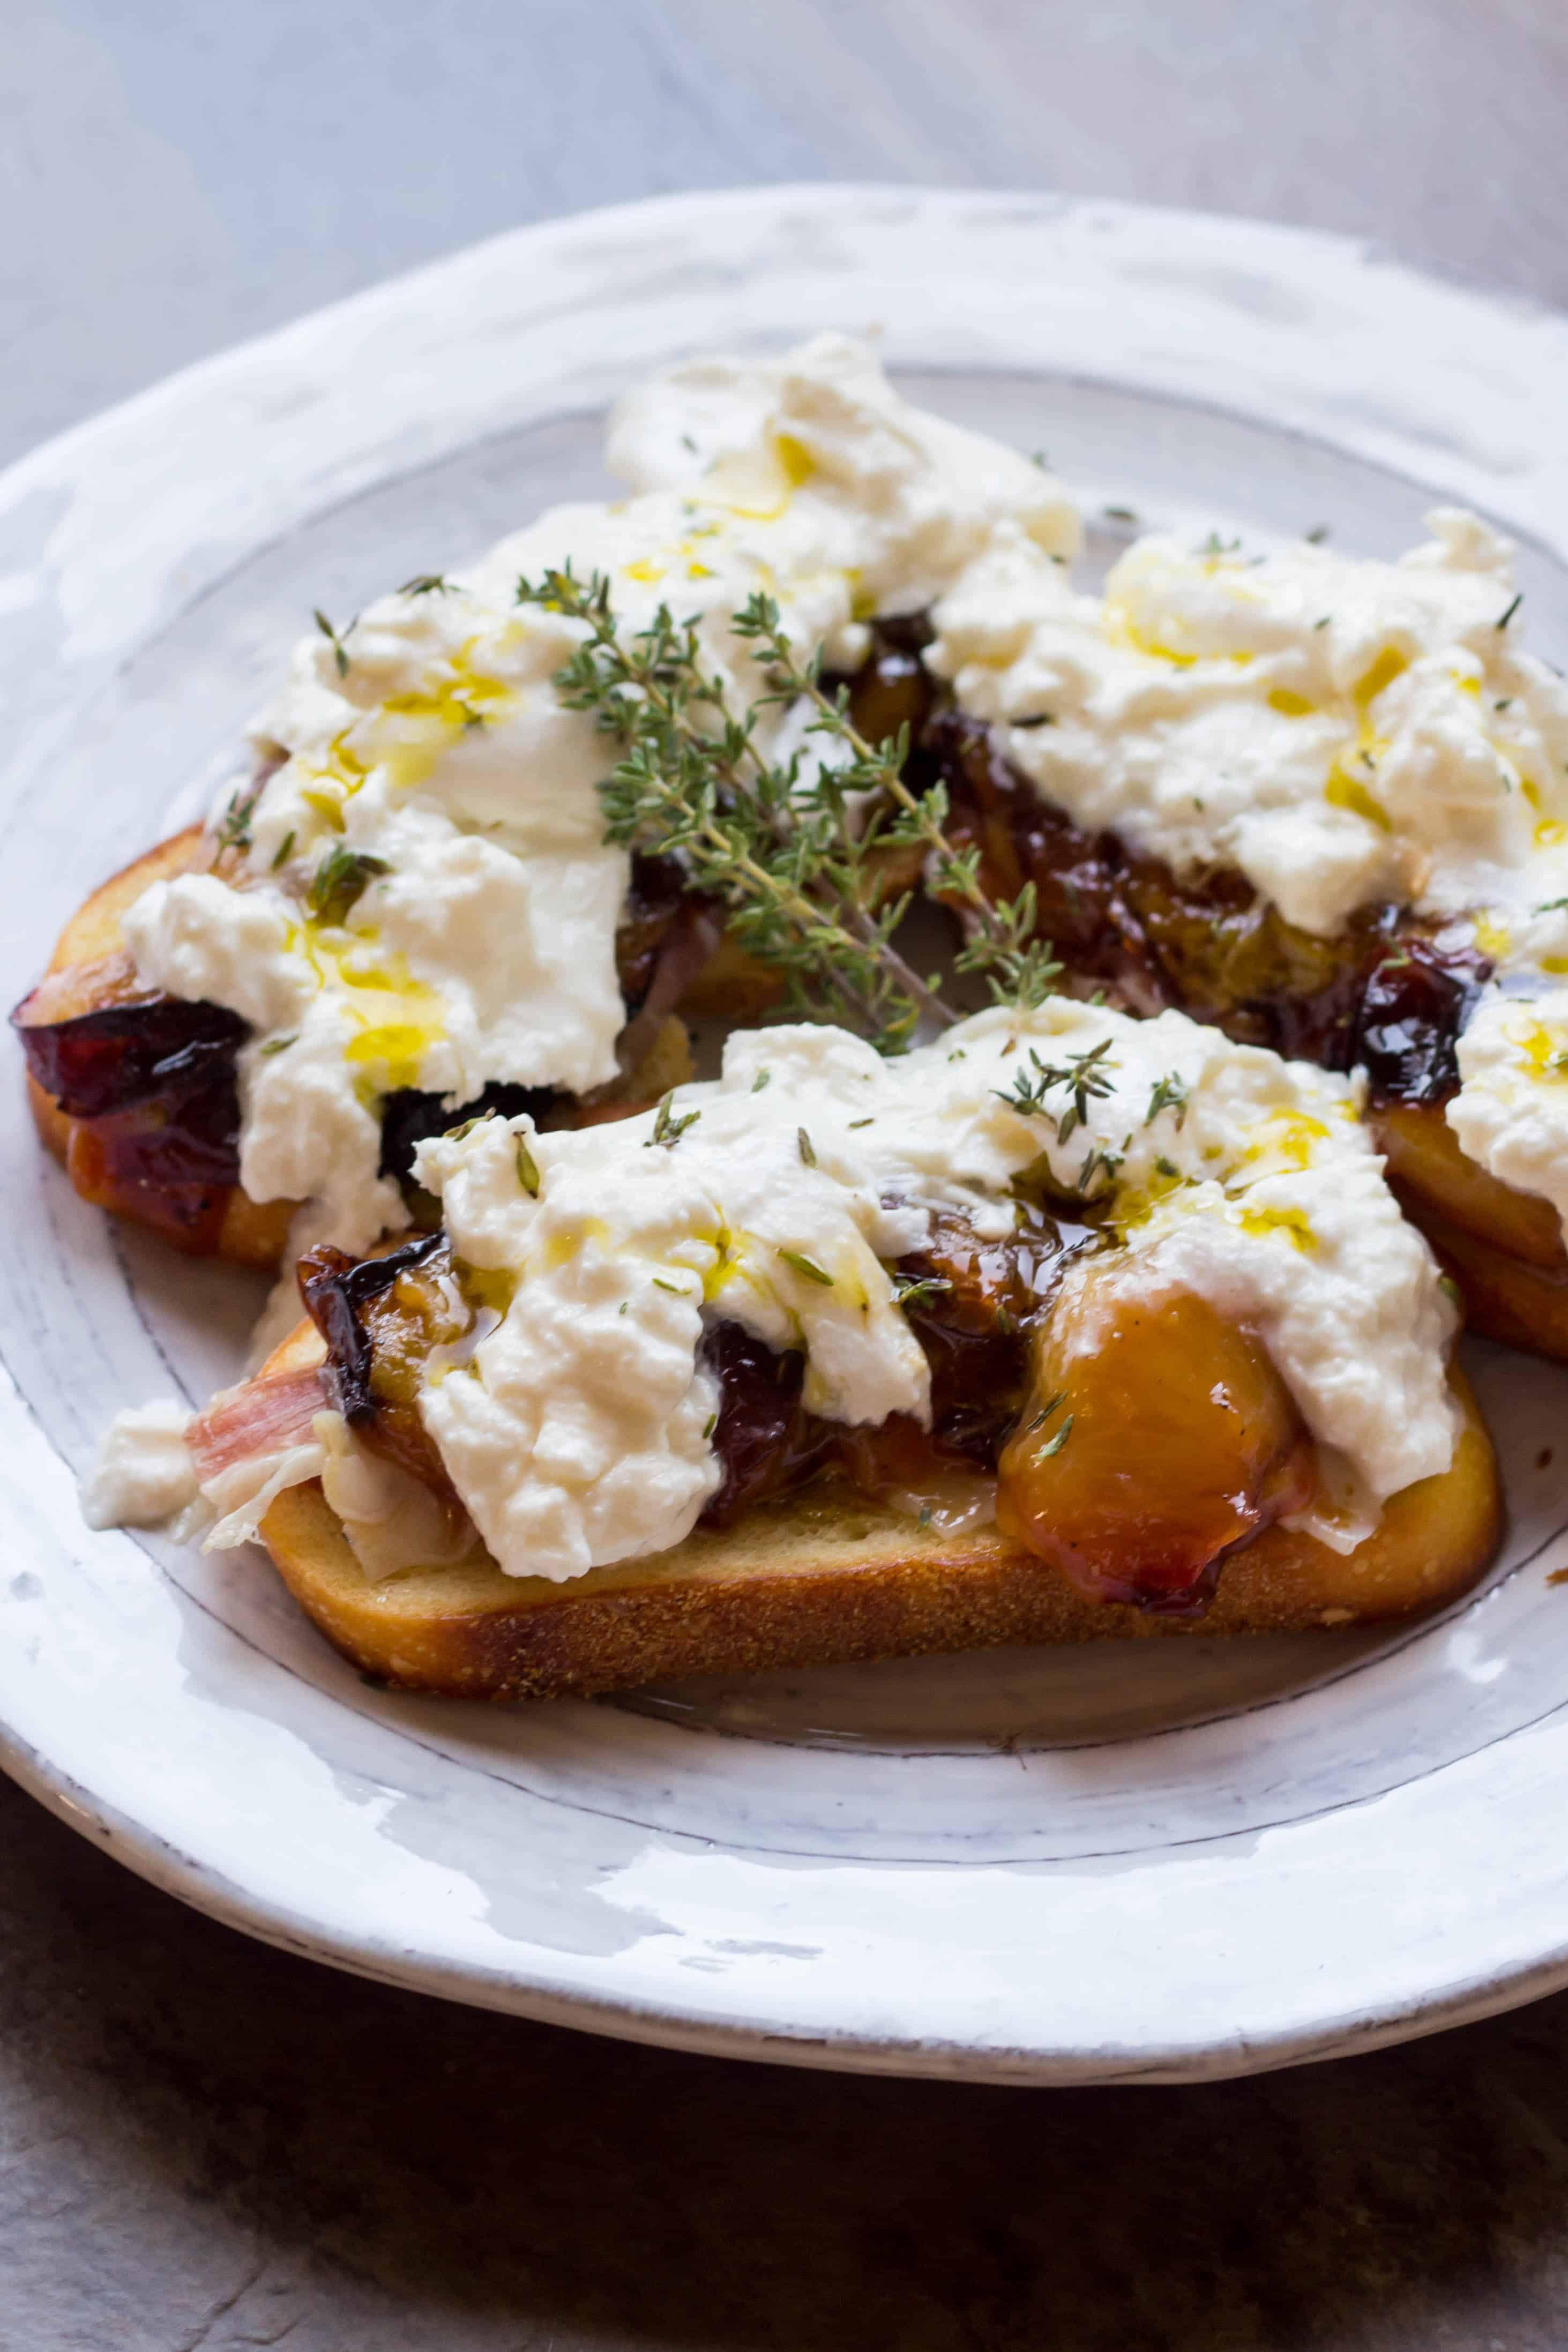 Honey Roasted Plum Crostini with Burrata and Prosciutto (Video!)